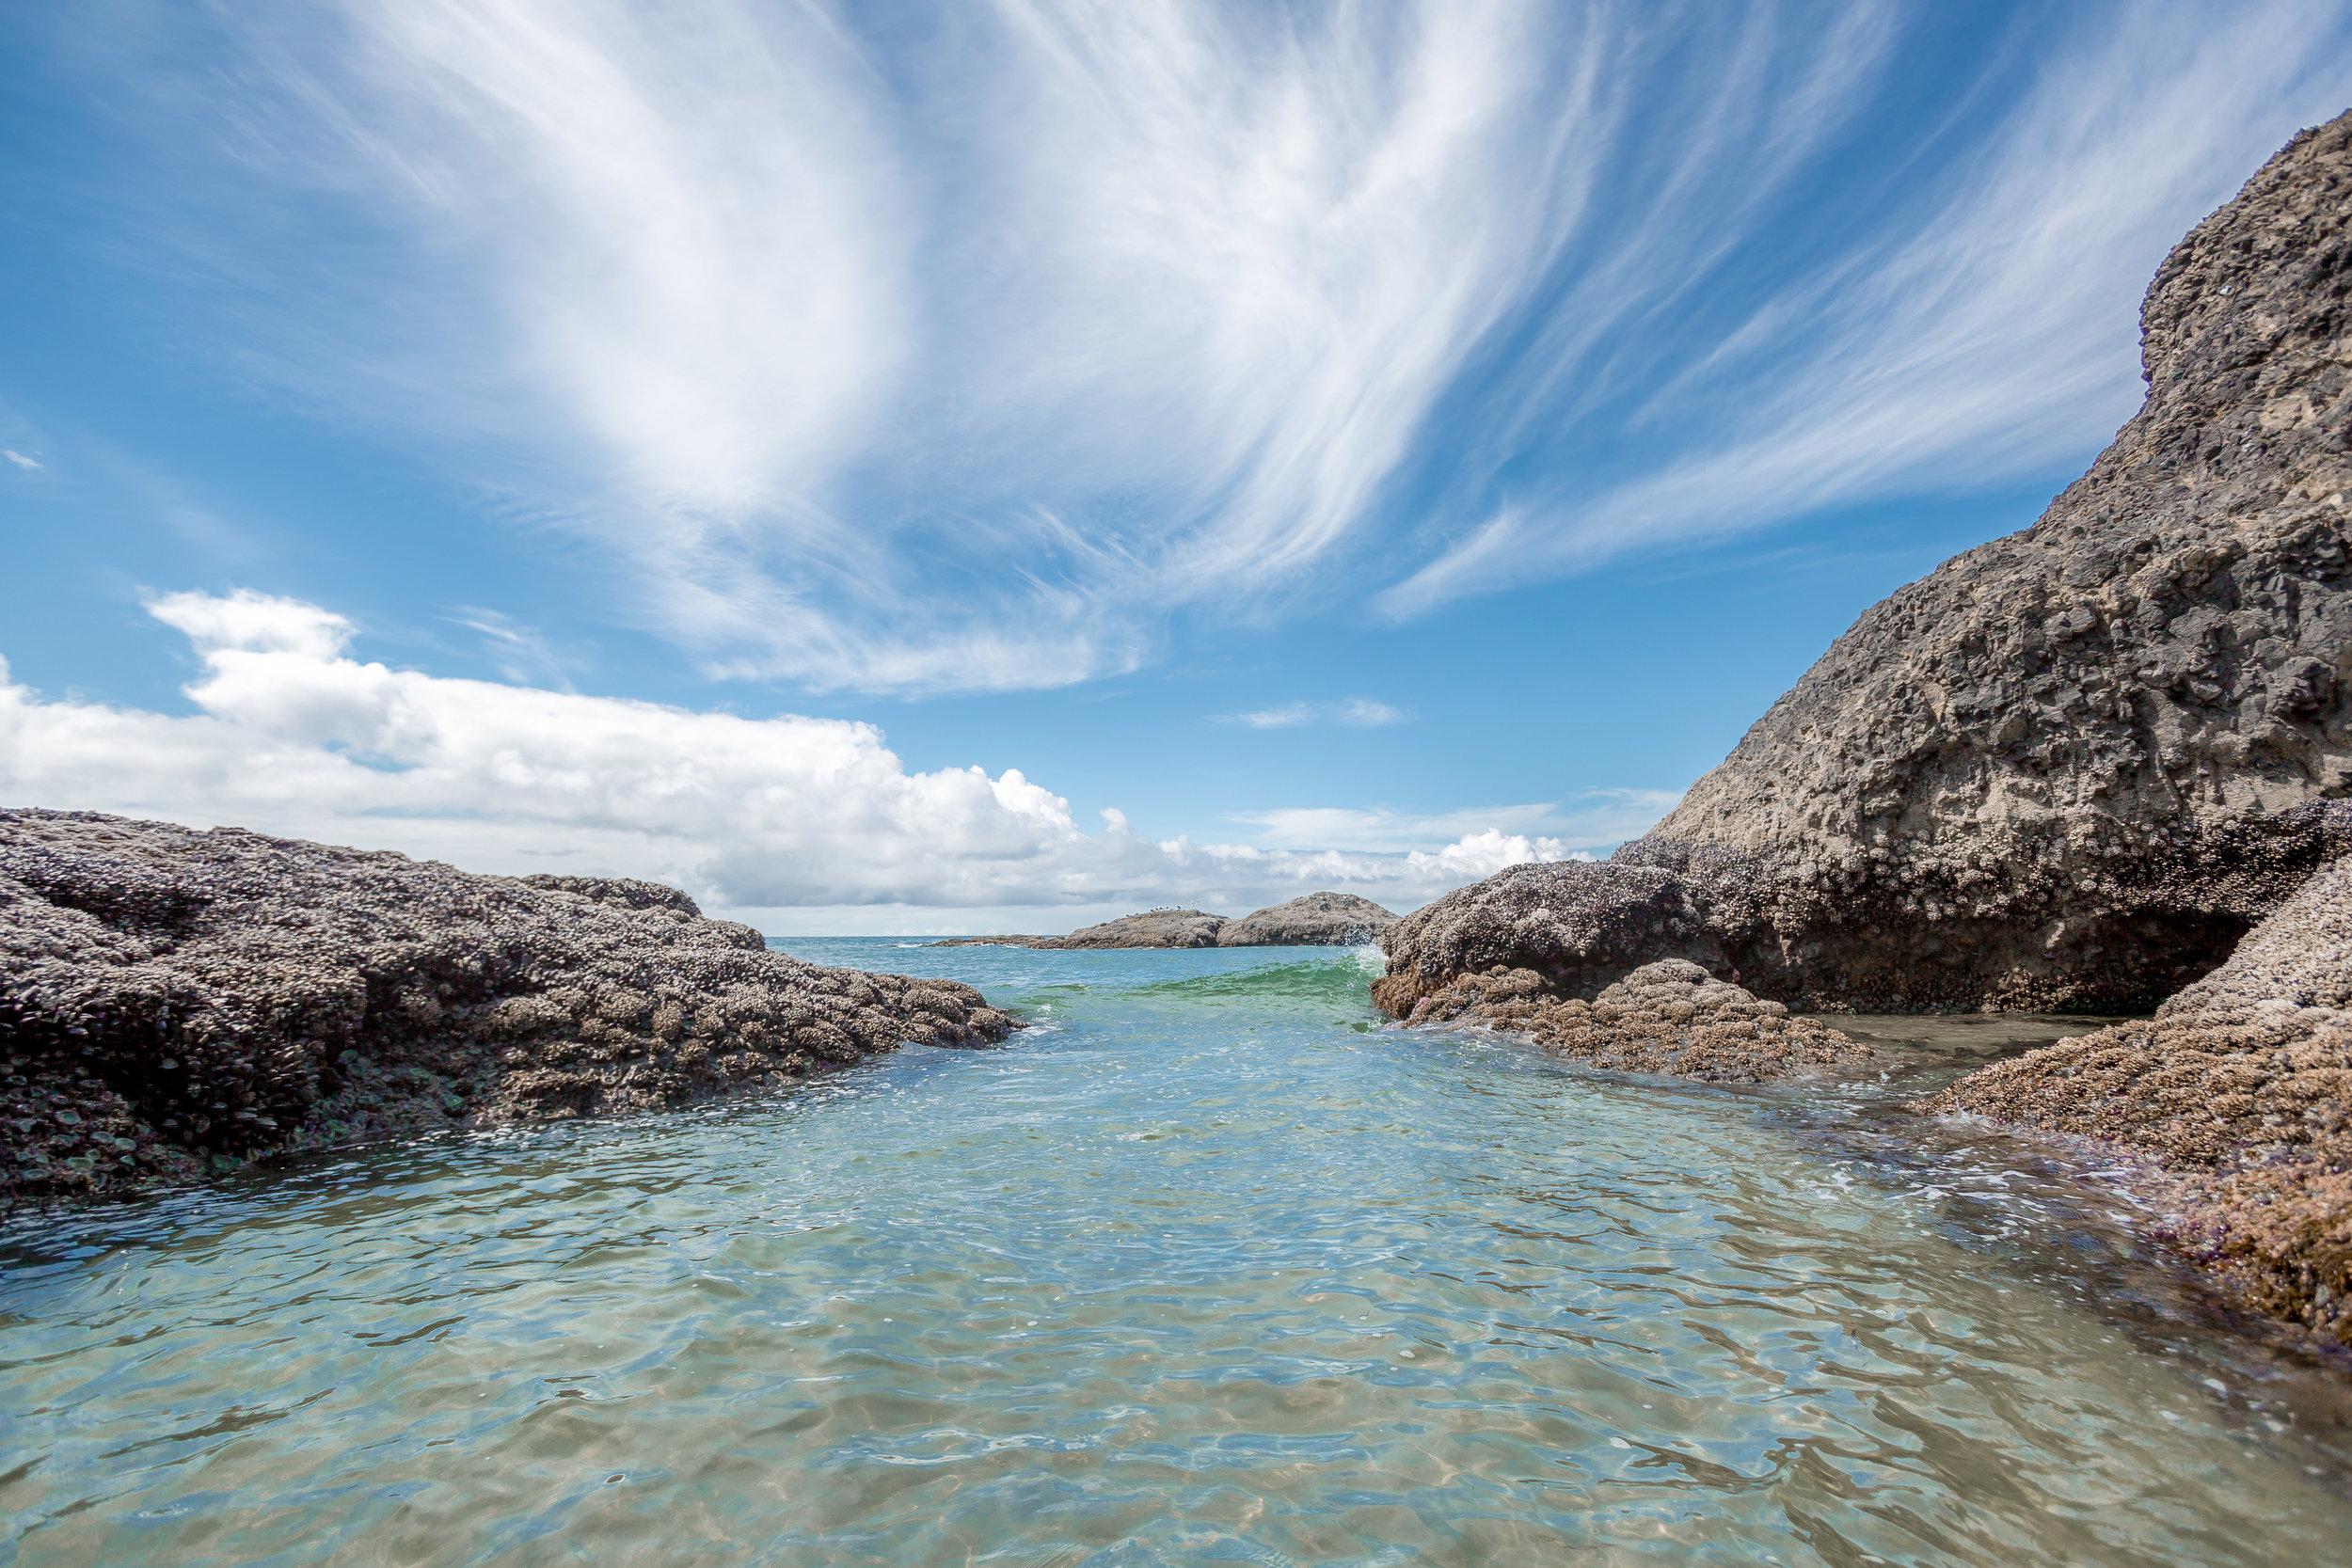 nicole-daacke-photography-oregon-coast-landscapes-elopement-photographer-wedding-photography-adventure-lifestyle-roadtrip-along-oregon-coast-cape-kiwanda-oceanside-beach-cannon-beach-oregon-pnw-16.jpg